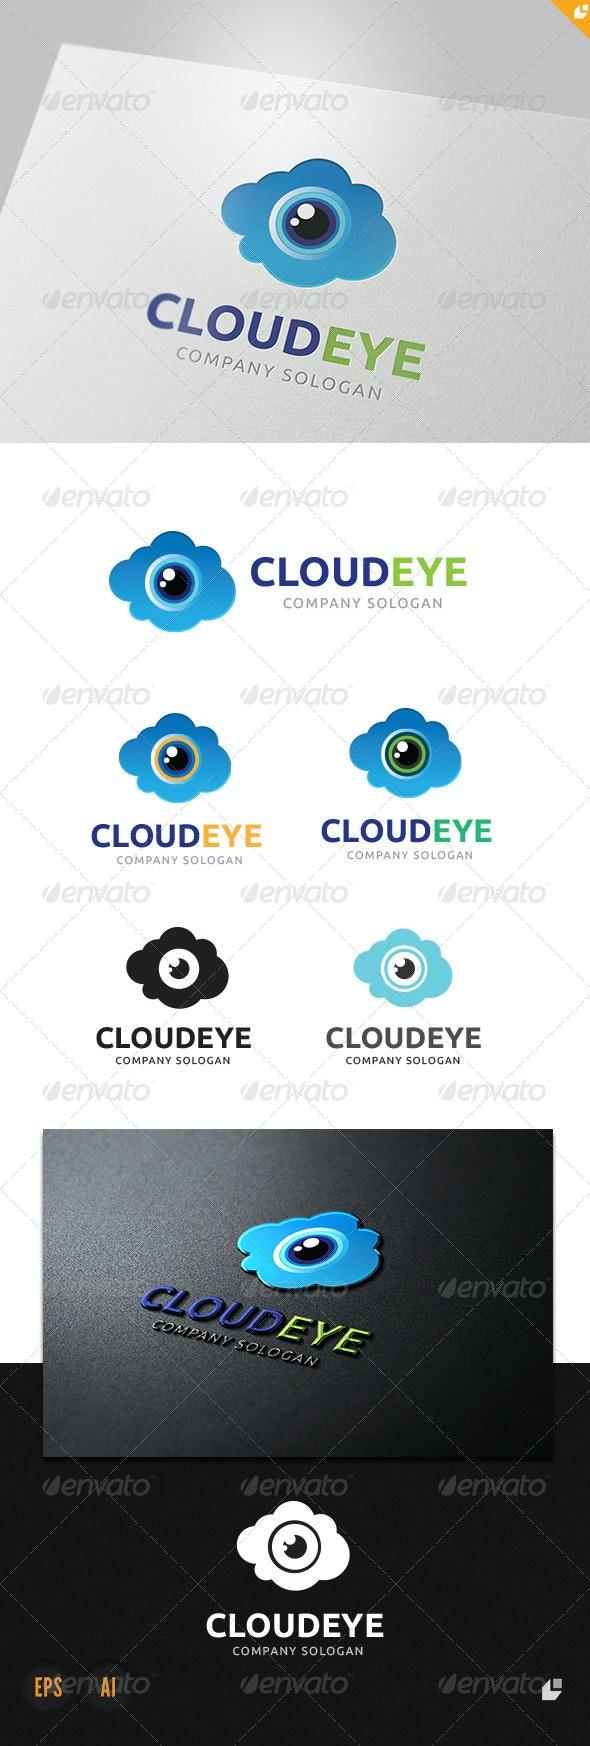 Cloud Eye Logo - Nature Logo Templates